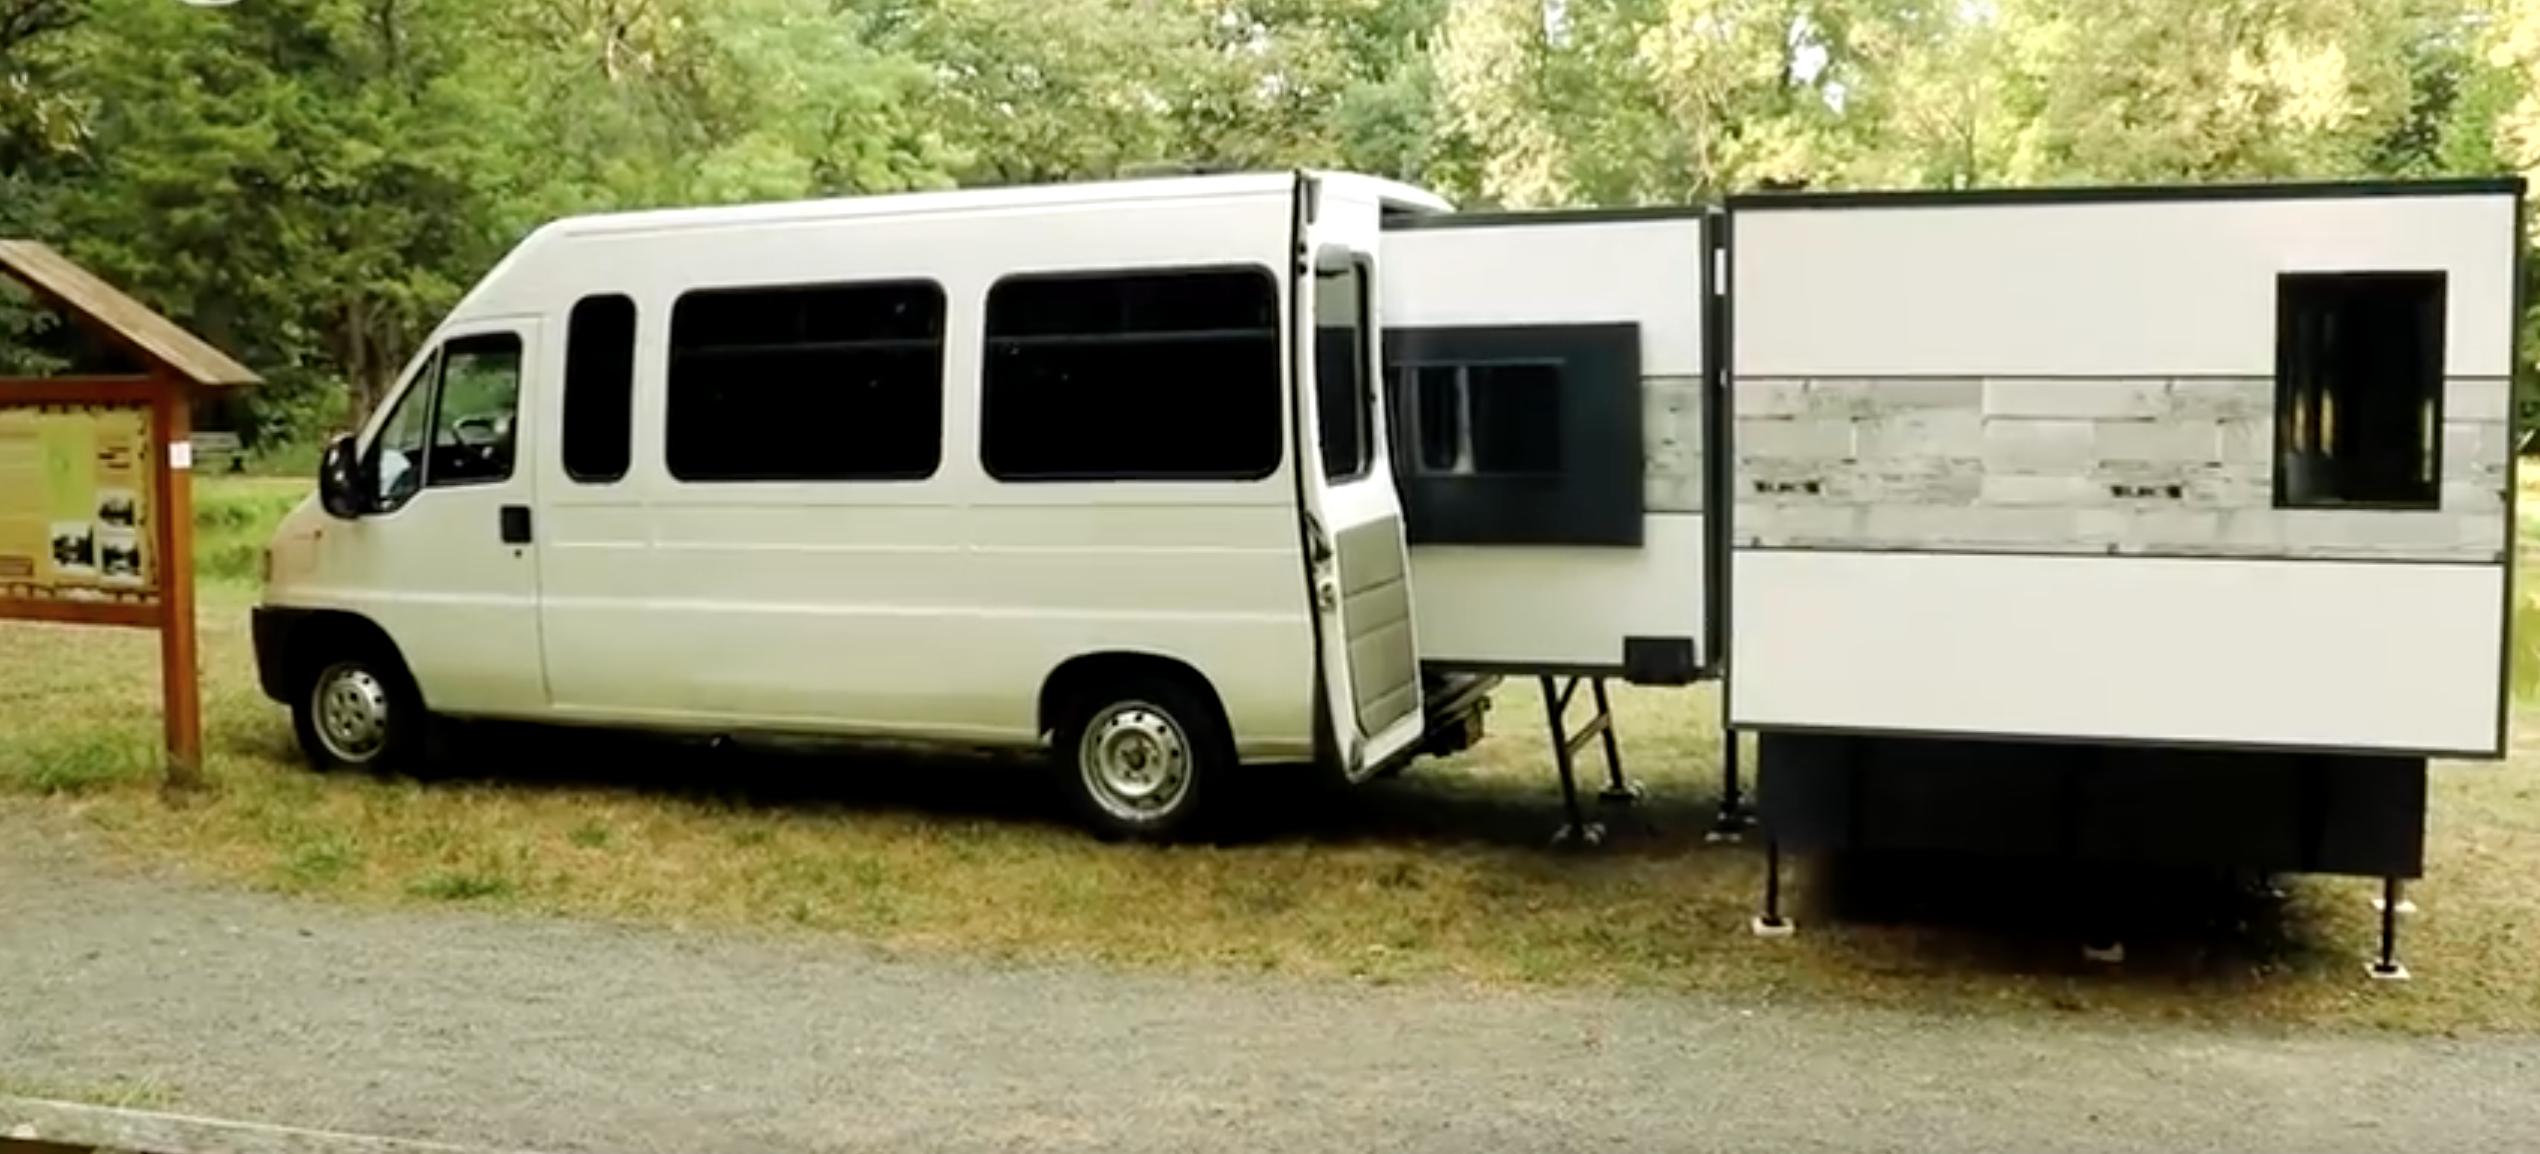 Extendable Camper - Cargo